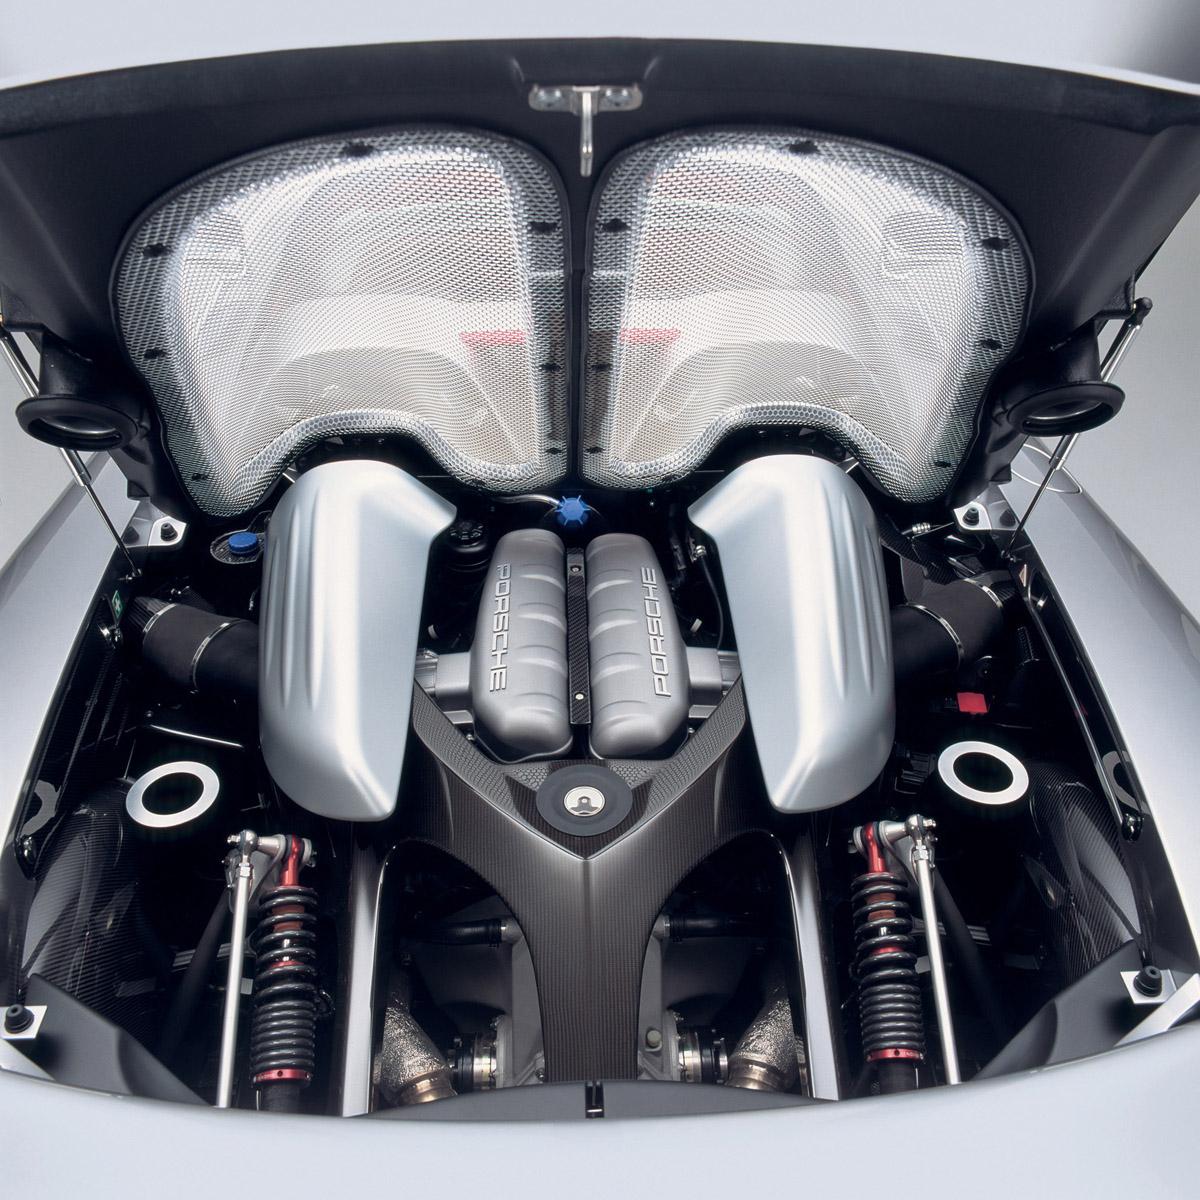 Porsche Carrera gt Interior Porsche Carrera gt Rear View